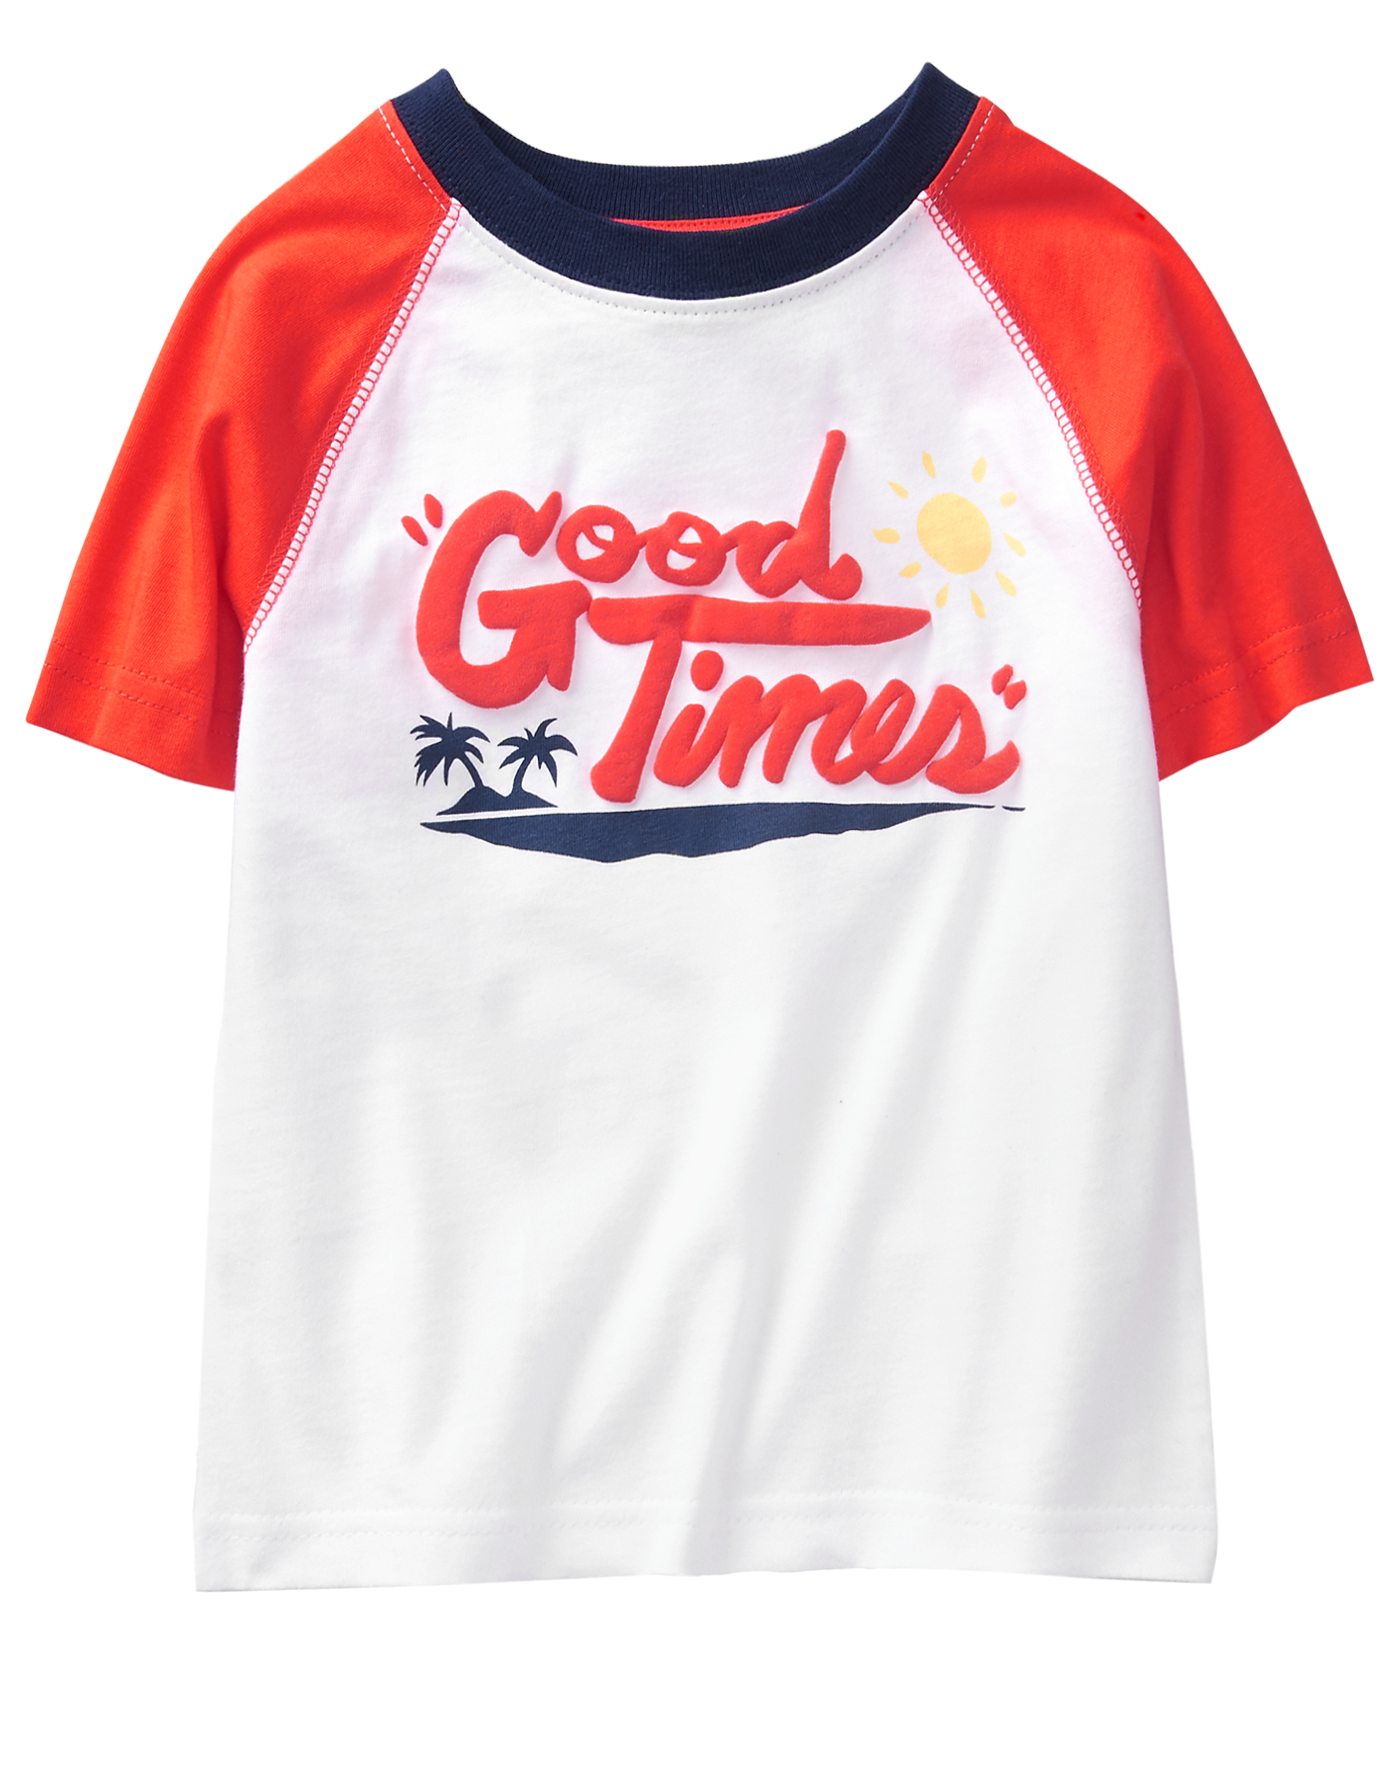 b5fe8058faba6 Good Times Tee   boys Spring/Summer 2019 Graphic tees   Kids prints ...